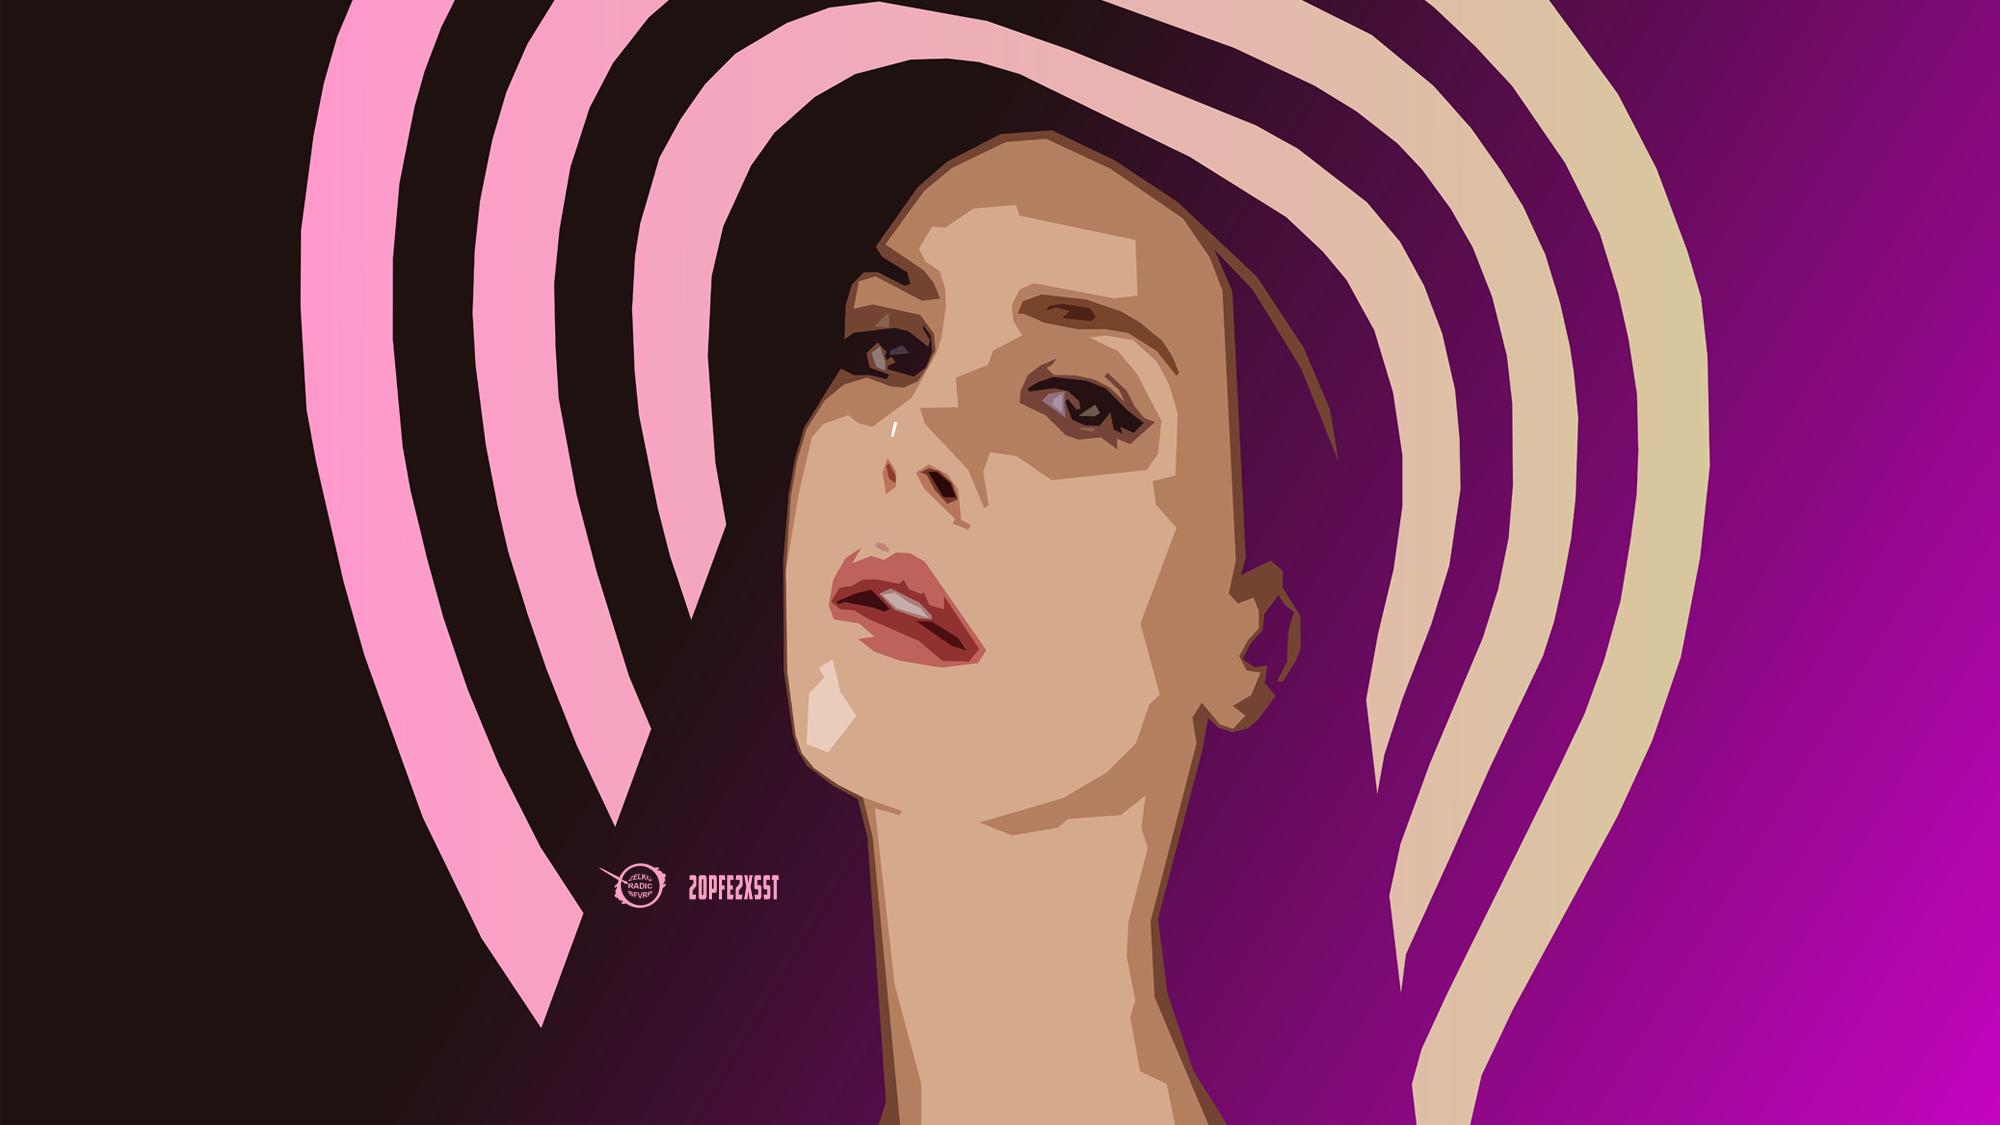 Clara alonso computer wallpapers desktop backgrounds 2560x1600 id - Hd Wallpaper Background Id 803626